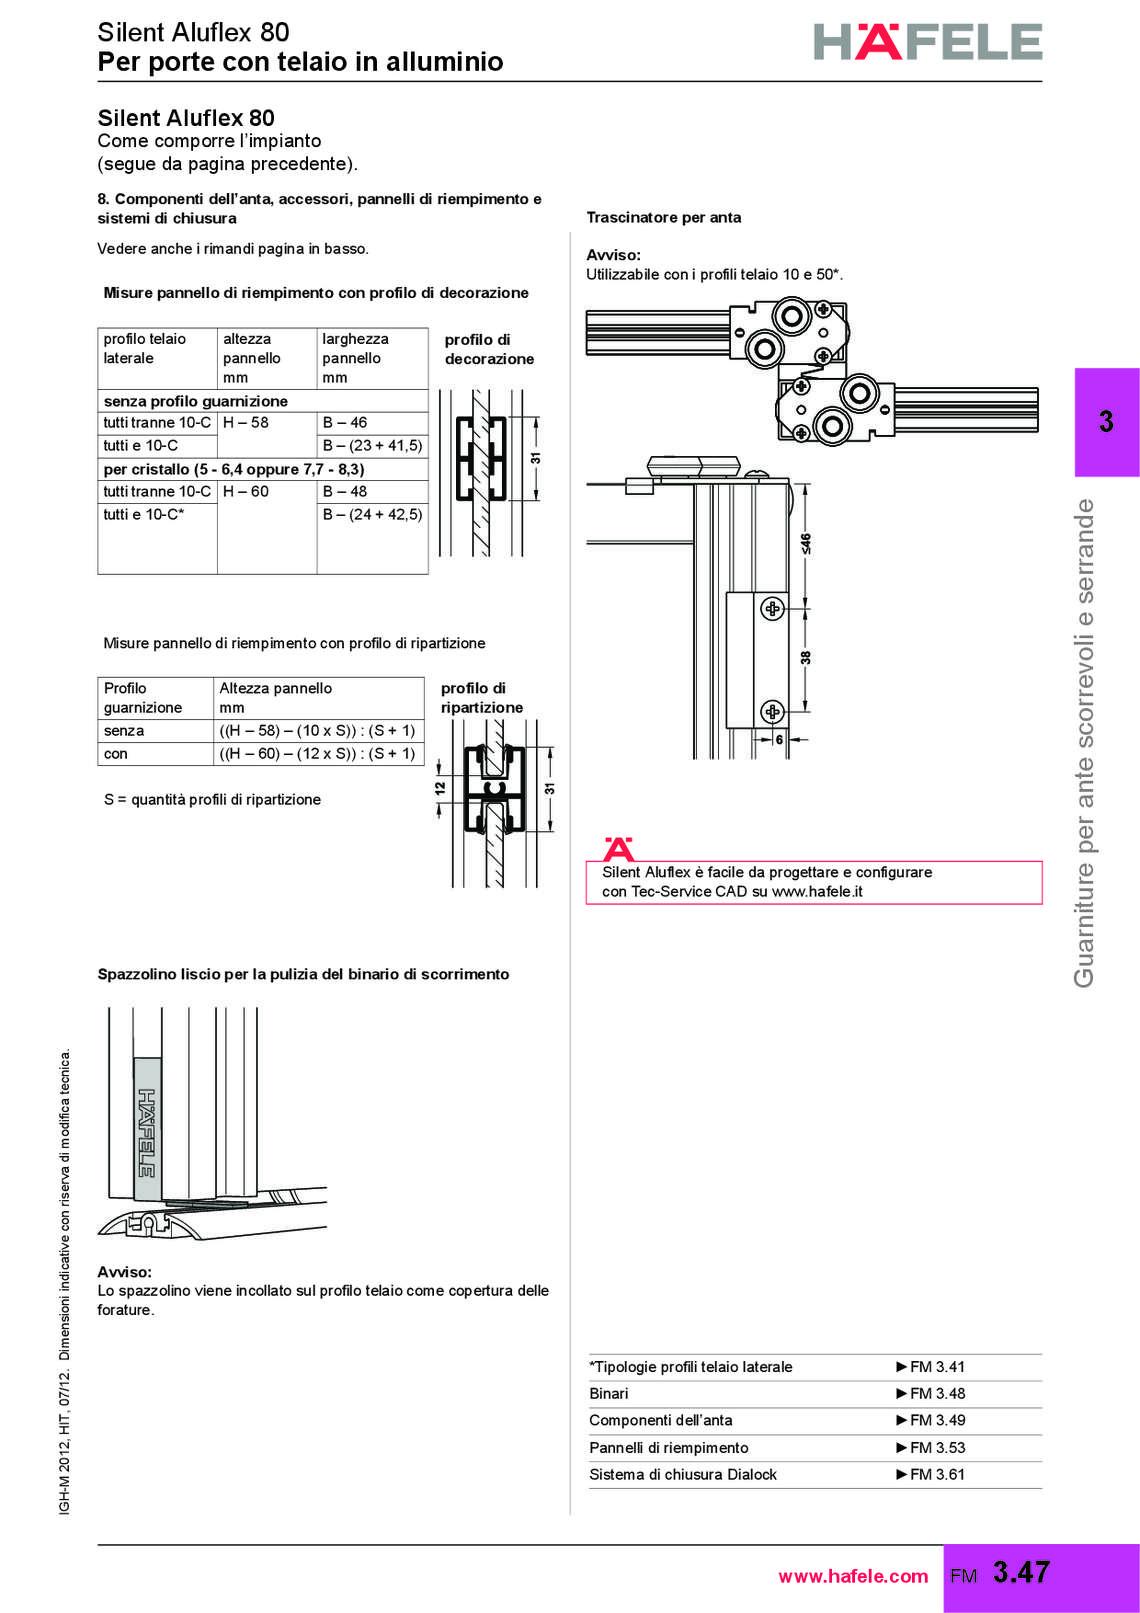 hafele-prodotti-su-misura_81_060.jpg